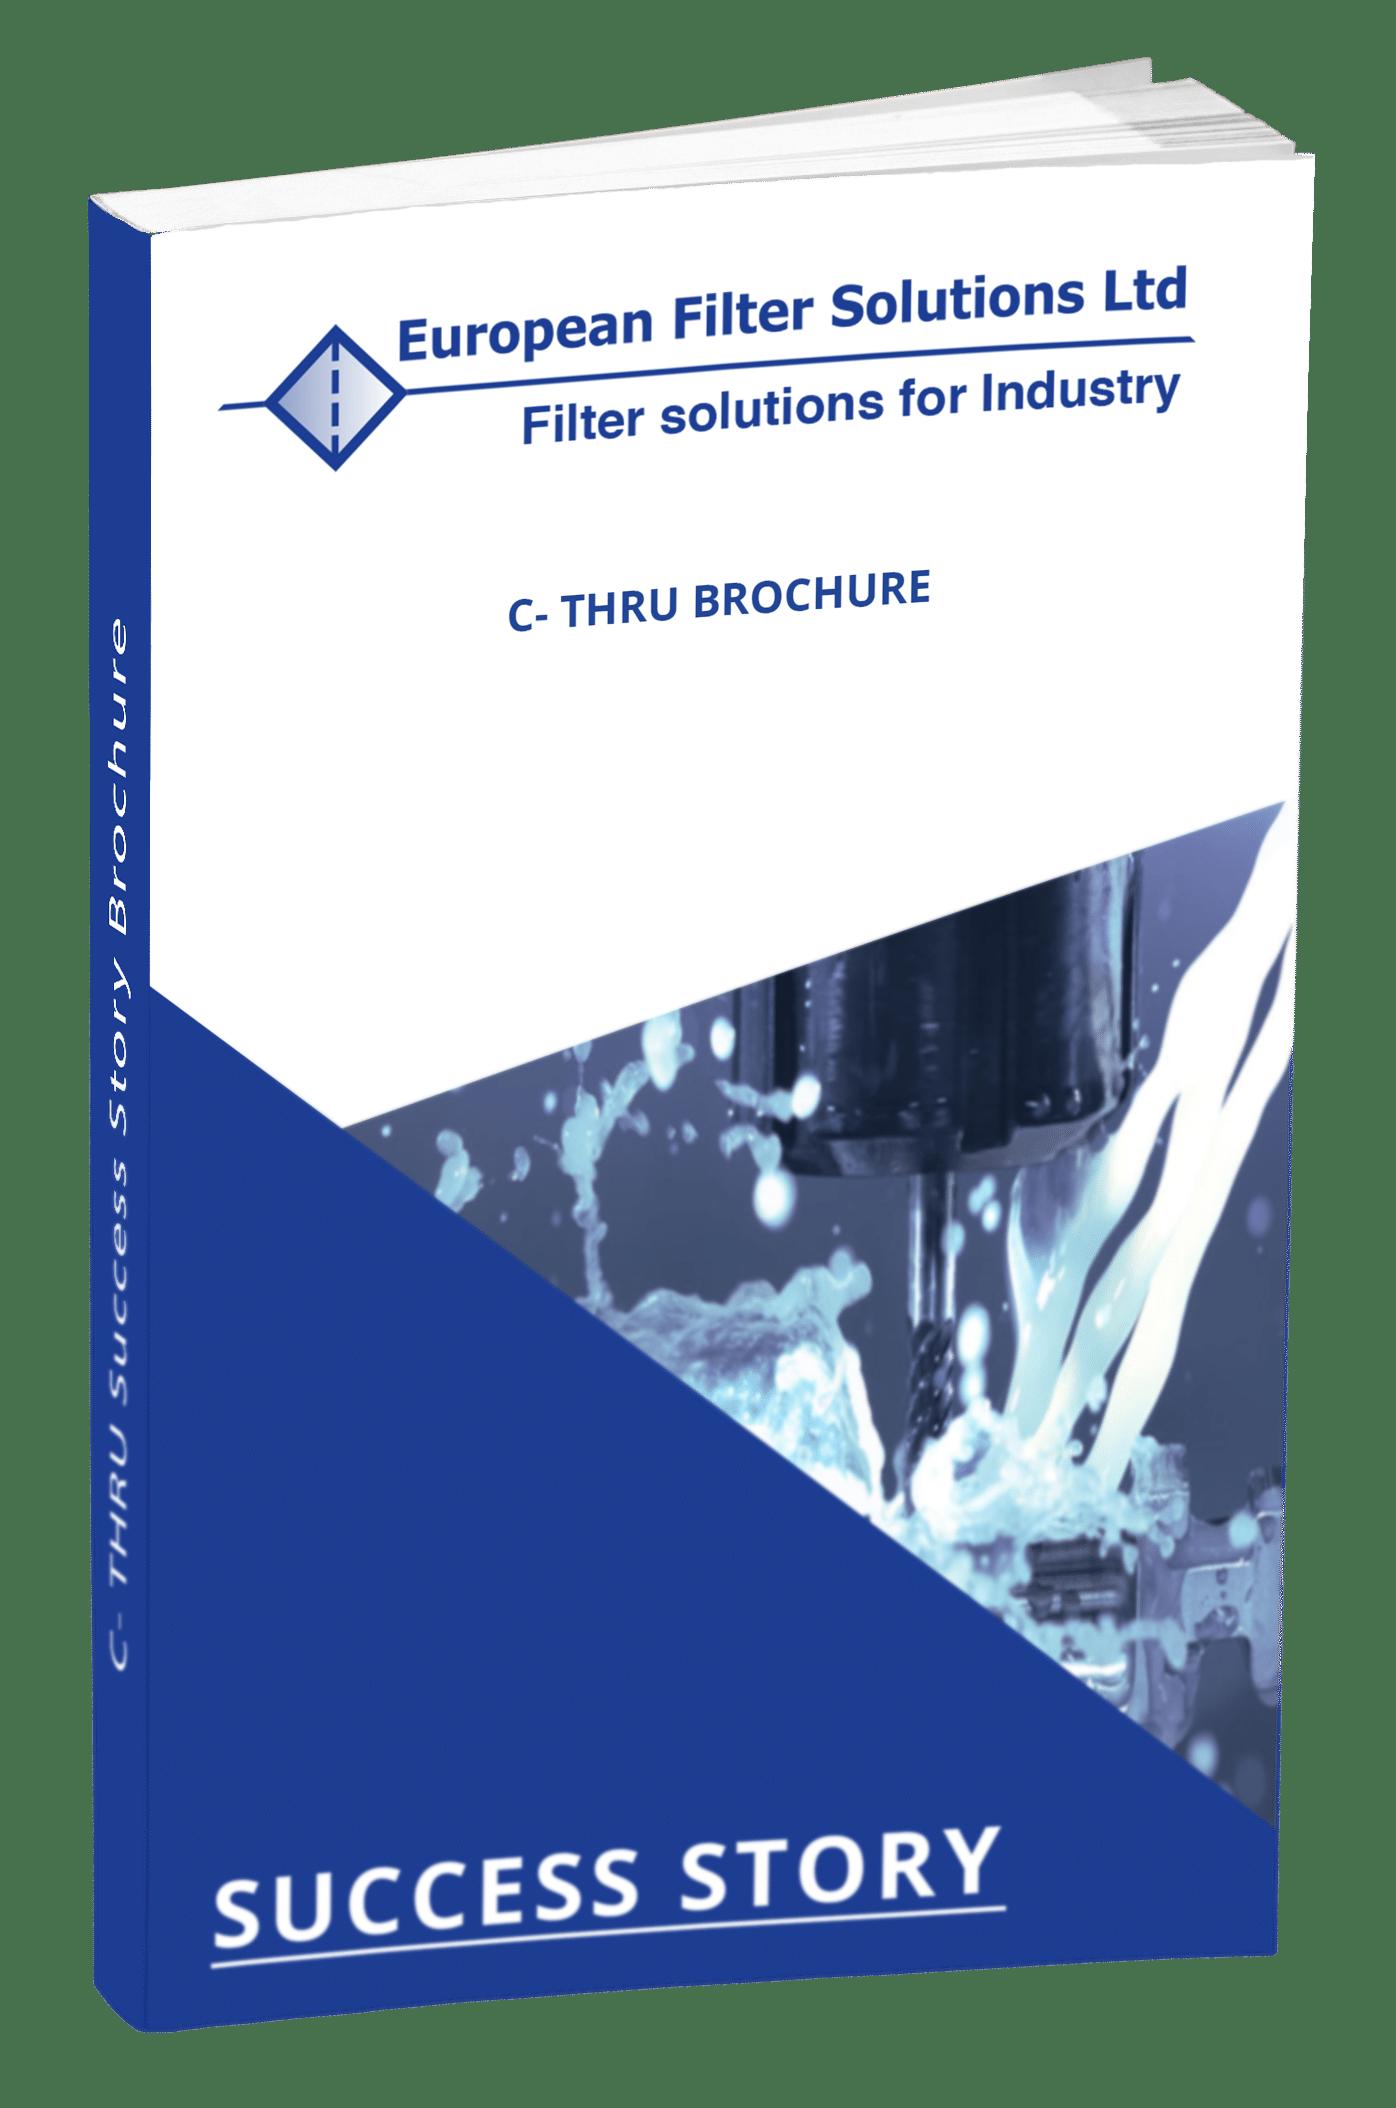 c thru success story brochure